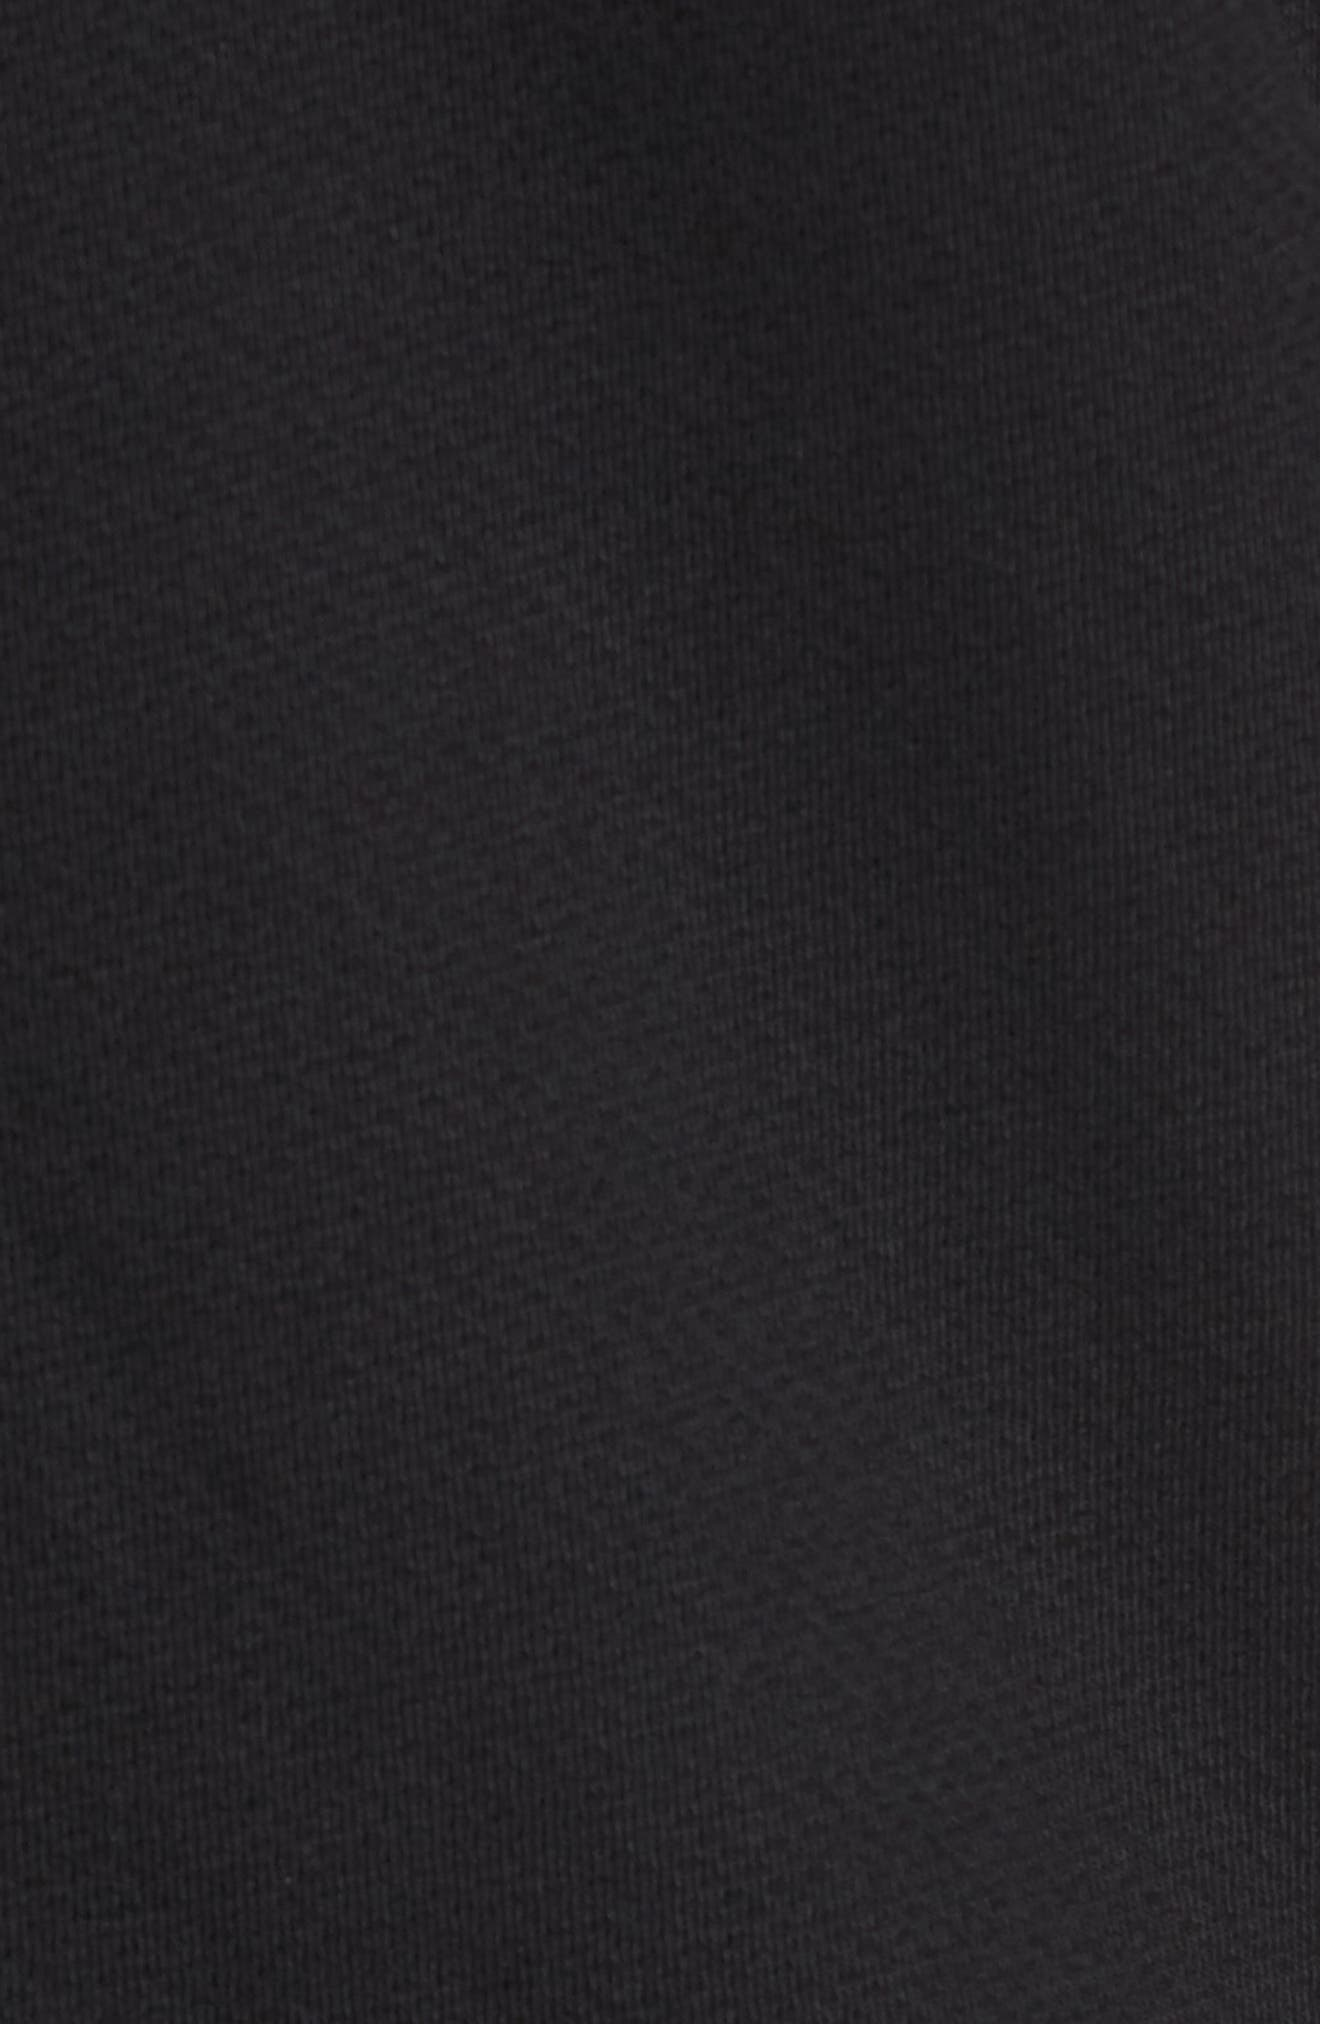 Rhodes Motorcross Knit Jacket,                             Alternate thumbnail 6, color,                             001